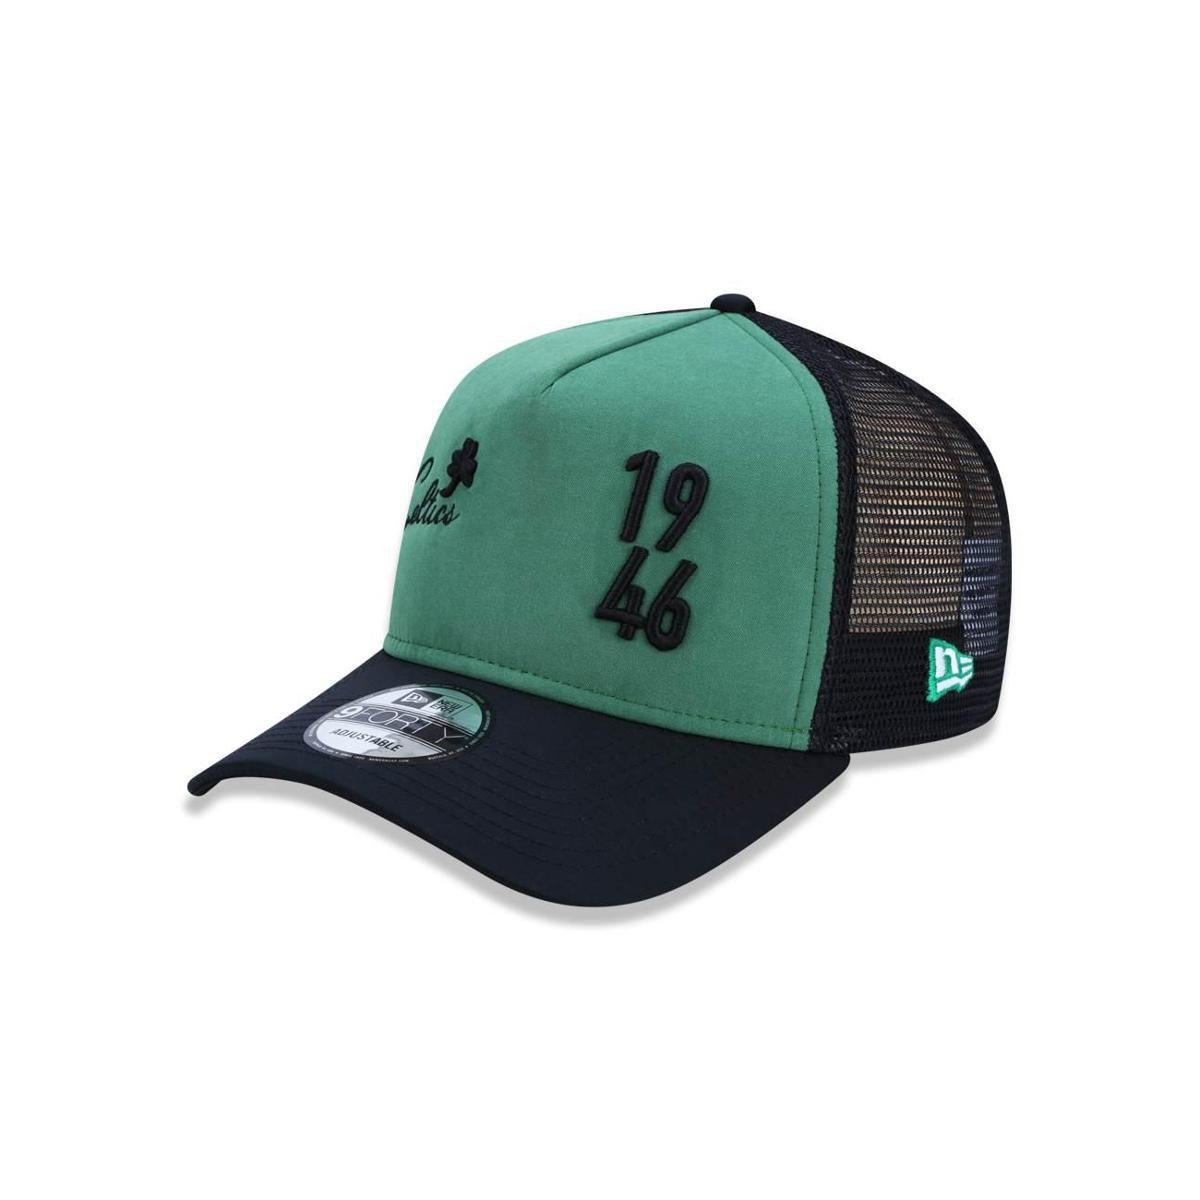 Boné 940 Boston Celtics NBA Aba Reta New Era - Verde e Preto - Compre Agora   db32c245ef6